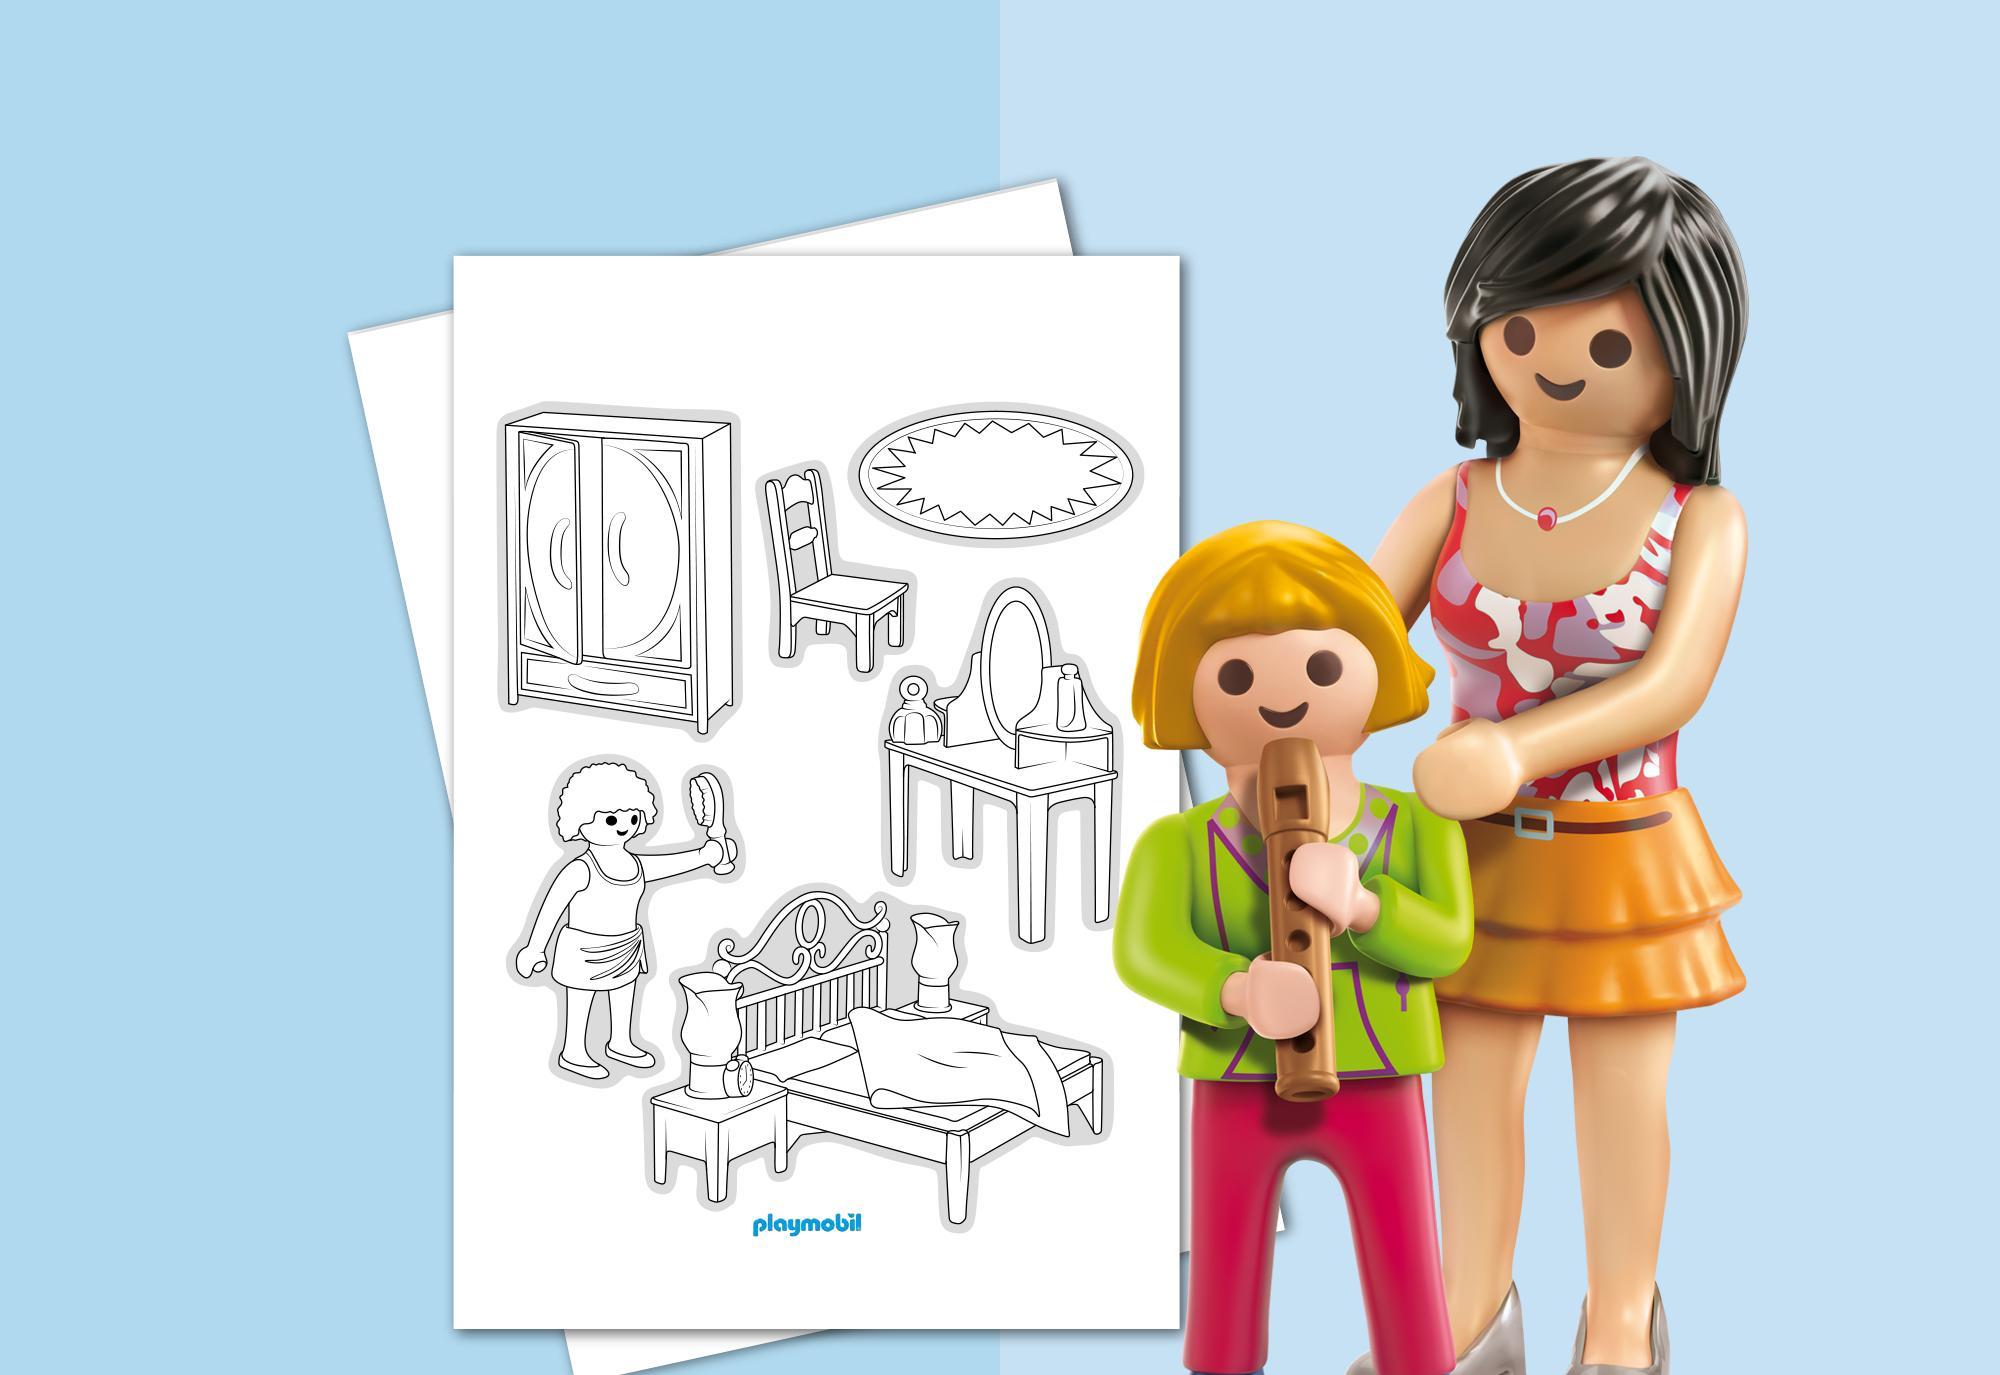 HOJAS PARA COLOREAR, PLAYMOBIL Casa de Muñecas Romántica Playmobil ...